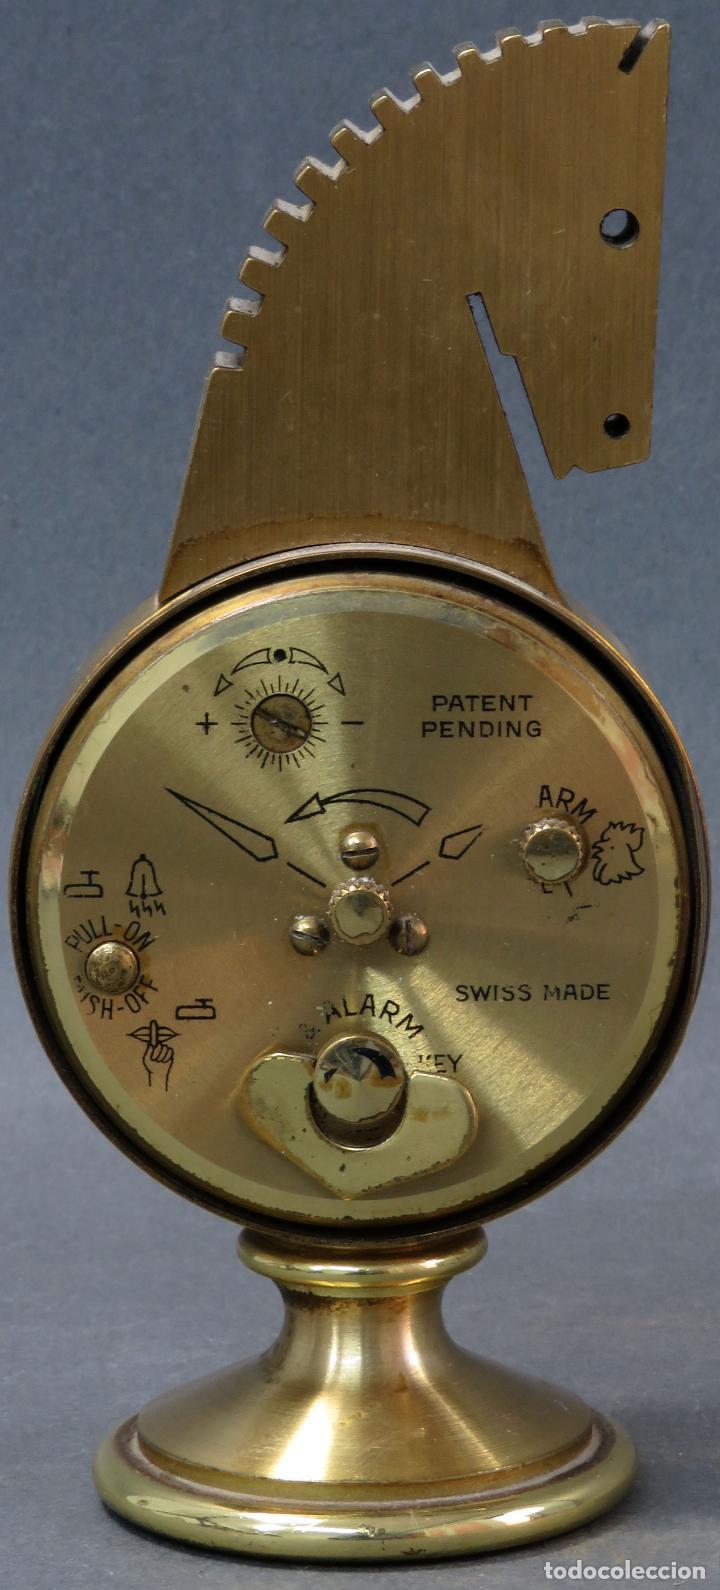 Despertadores antiguos: Reloj despertador bronce forma cabeza caballo Swiza ocho días funcionando años 80 - Foto 4 - 124628555